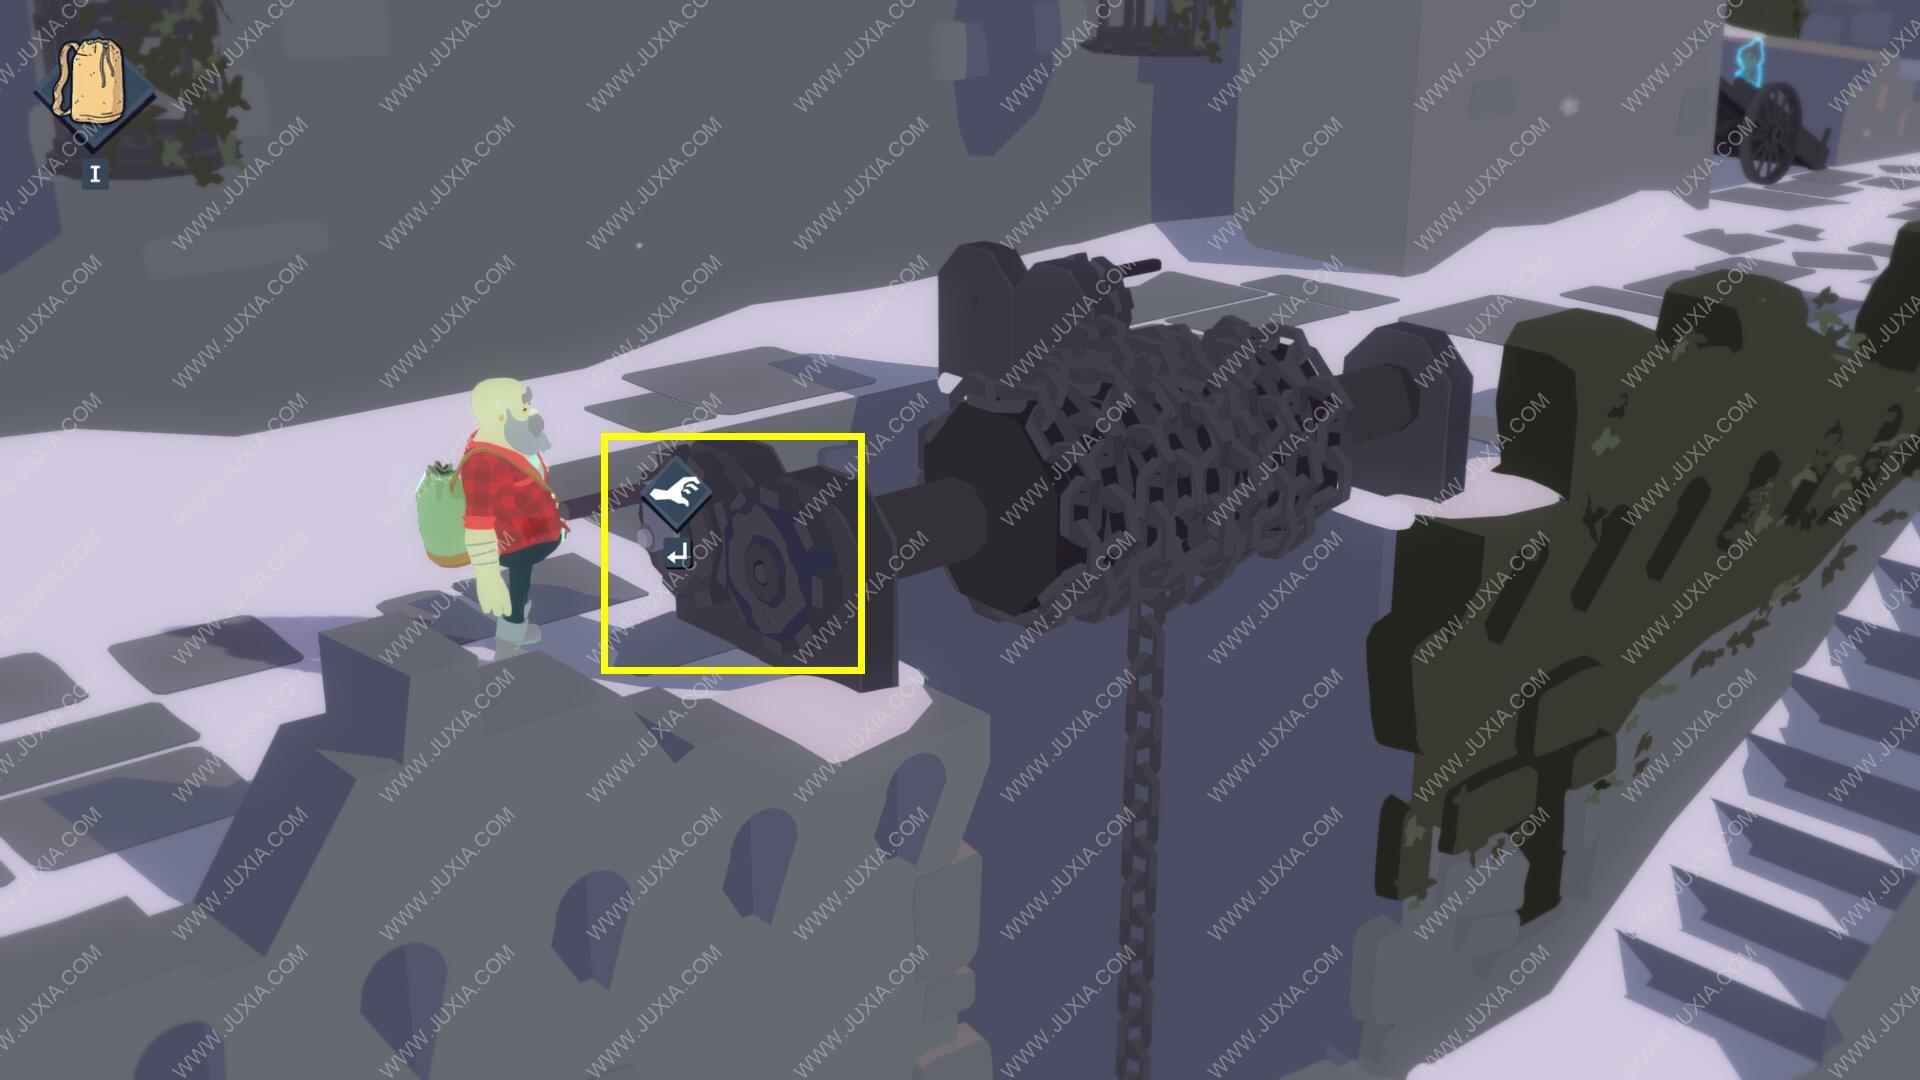 Röki完整攻略 第三章攻略中铁笼怎么调整